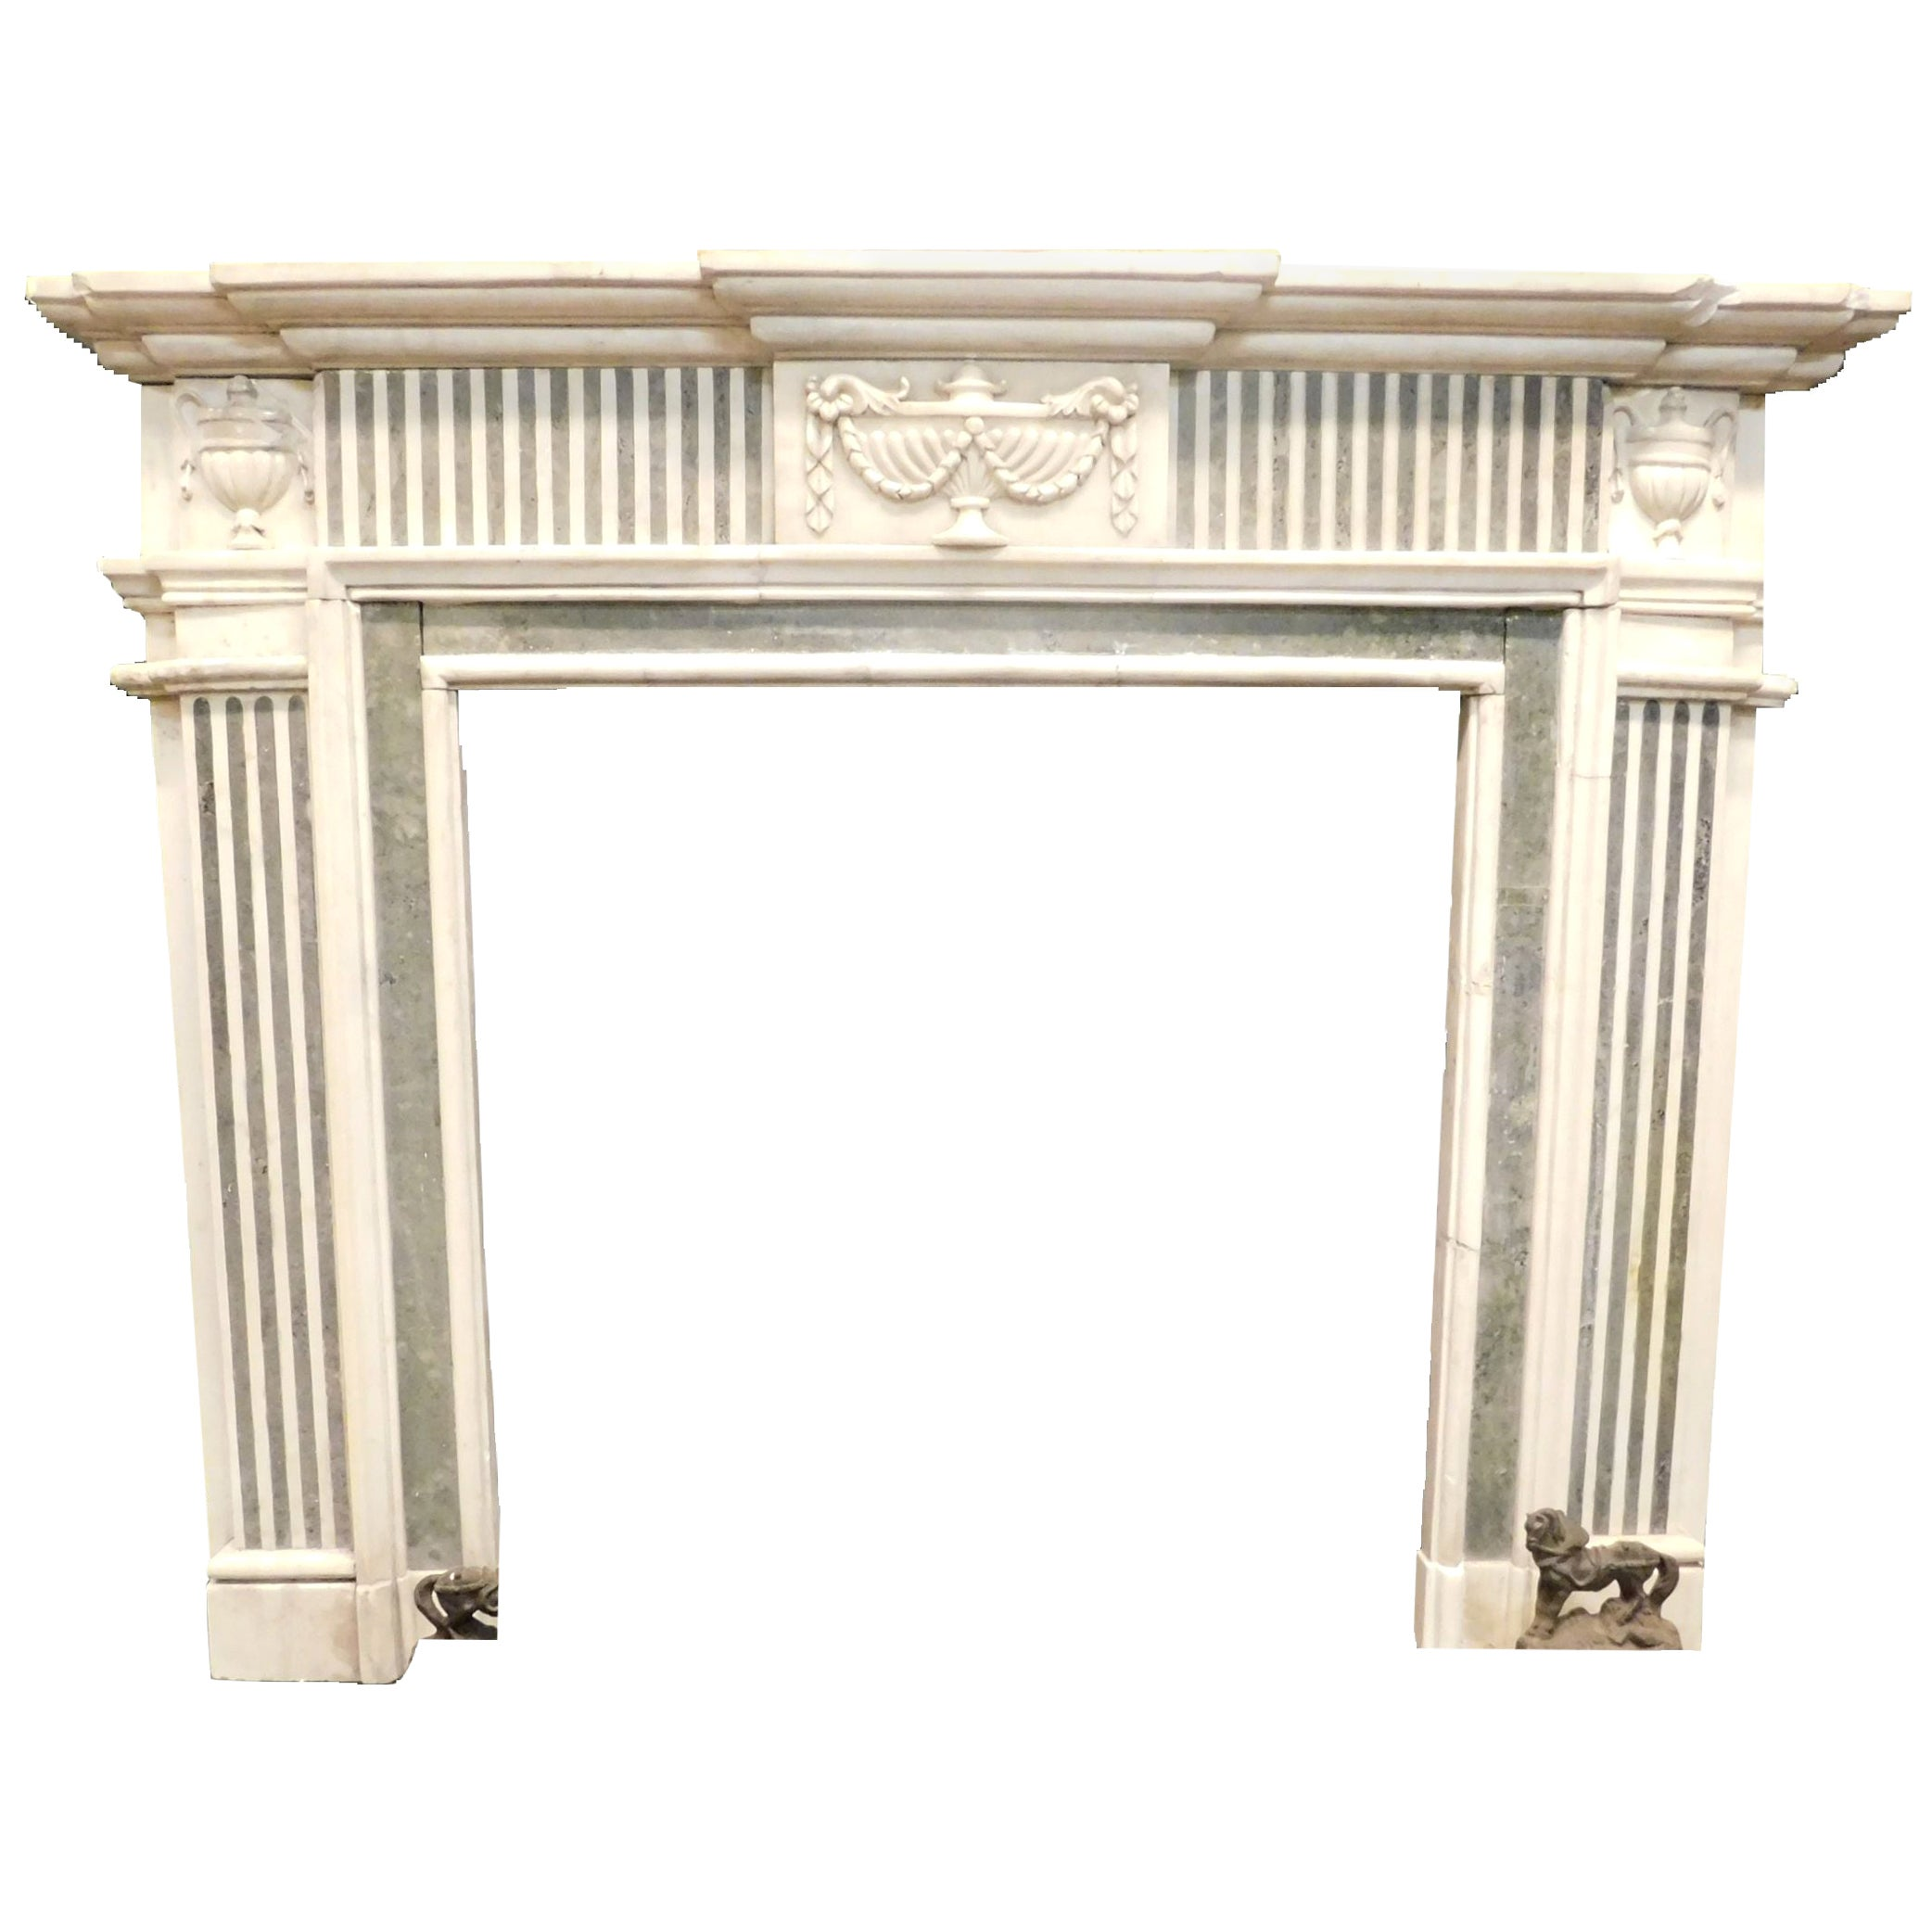 Antique White Carrara Marble Fireplace Inlaid Verde Alpi, 19th Century, Italy